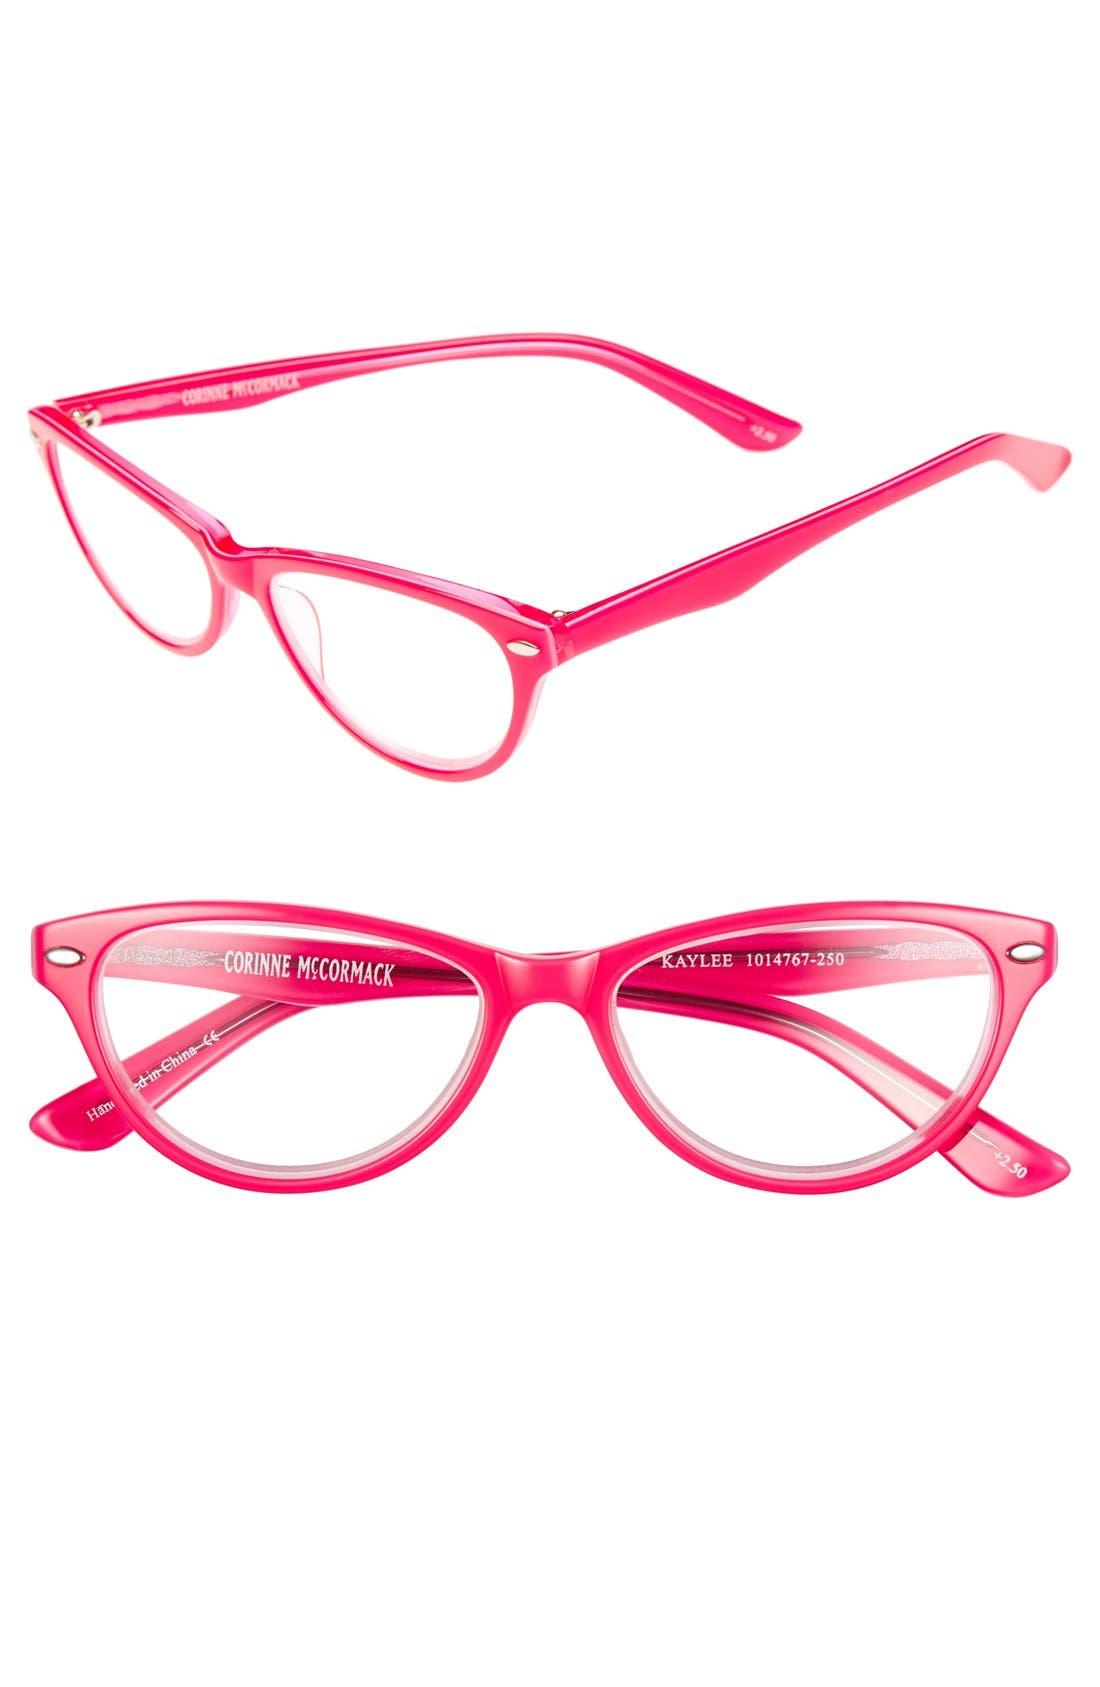 Main Image - Corinne McCormack 'Kaylee' Reading Glasses